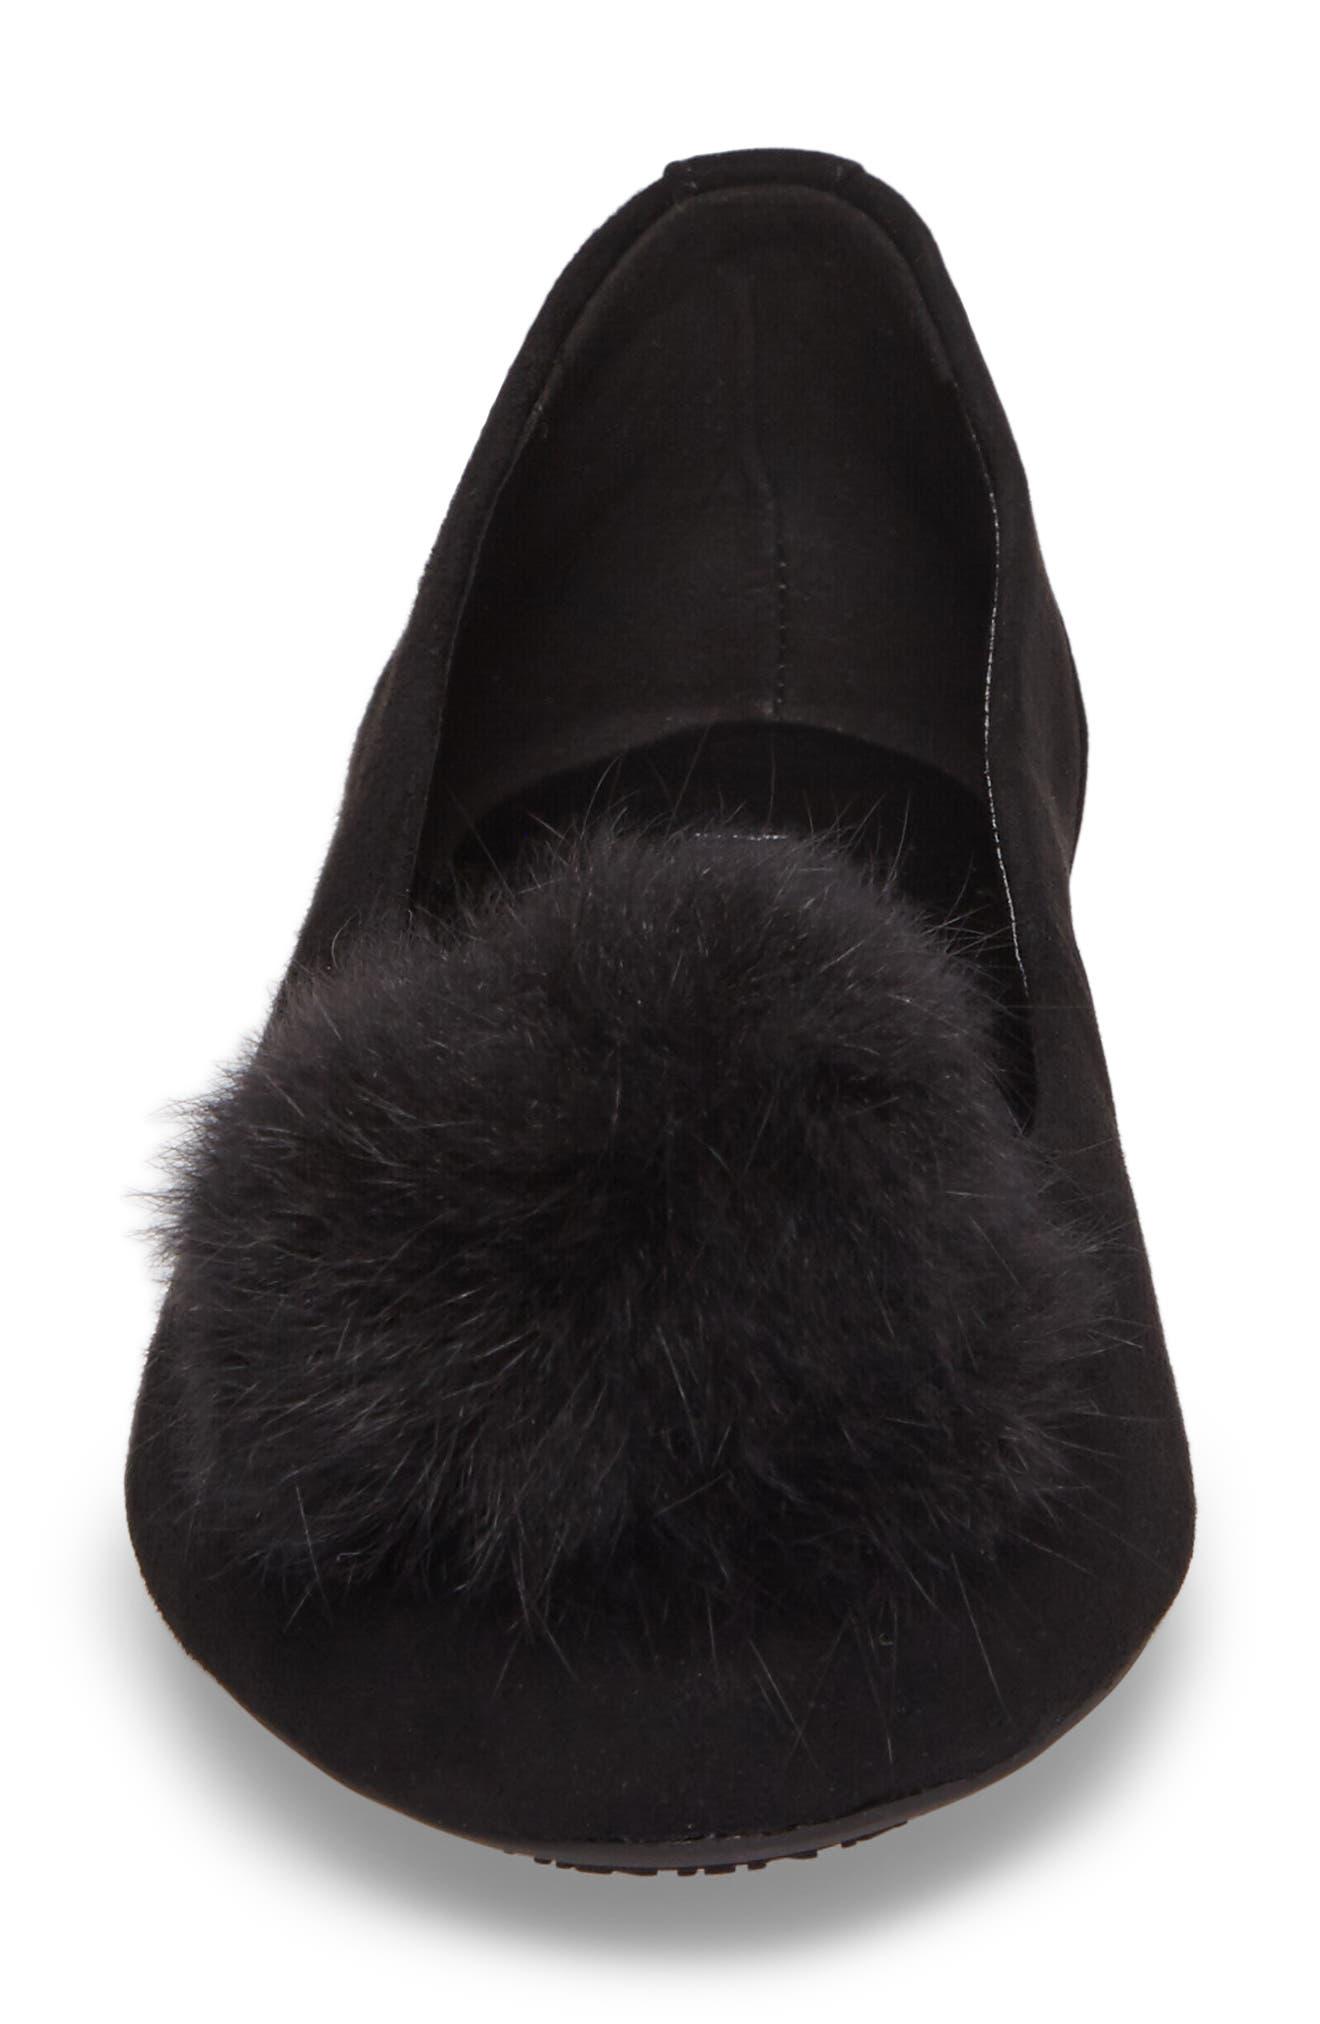 Remi Ballet Flat with Genuine Rabbit Fur Pom,                             Alternate thumbnail 4, color,                             001